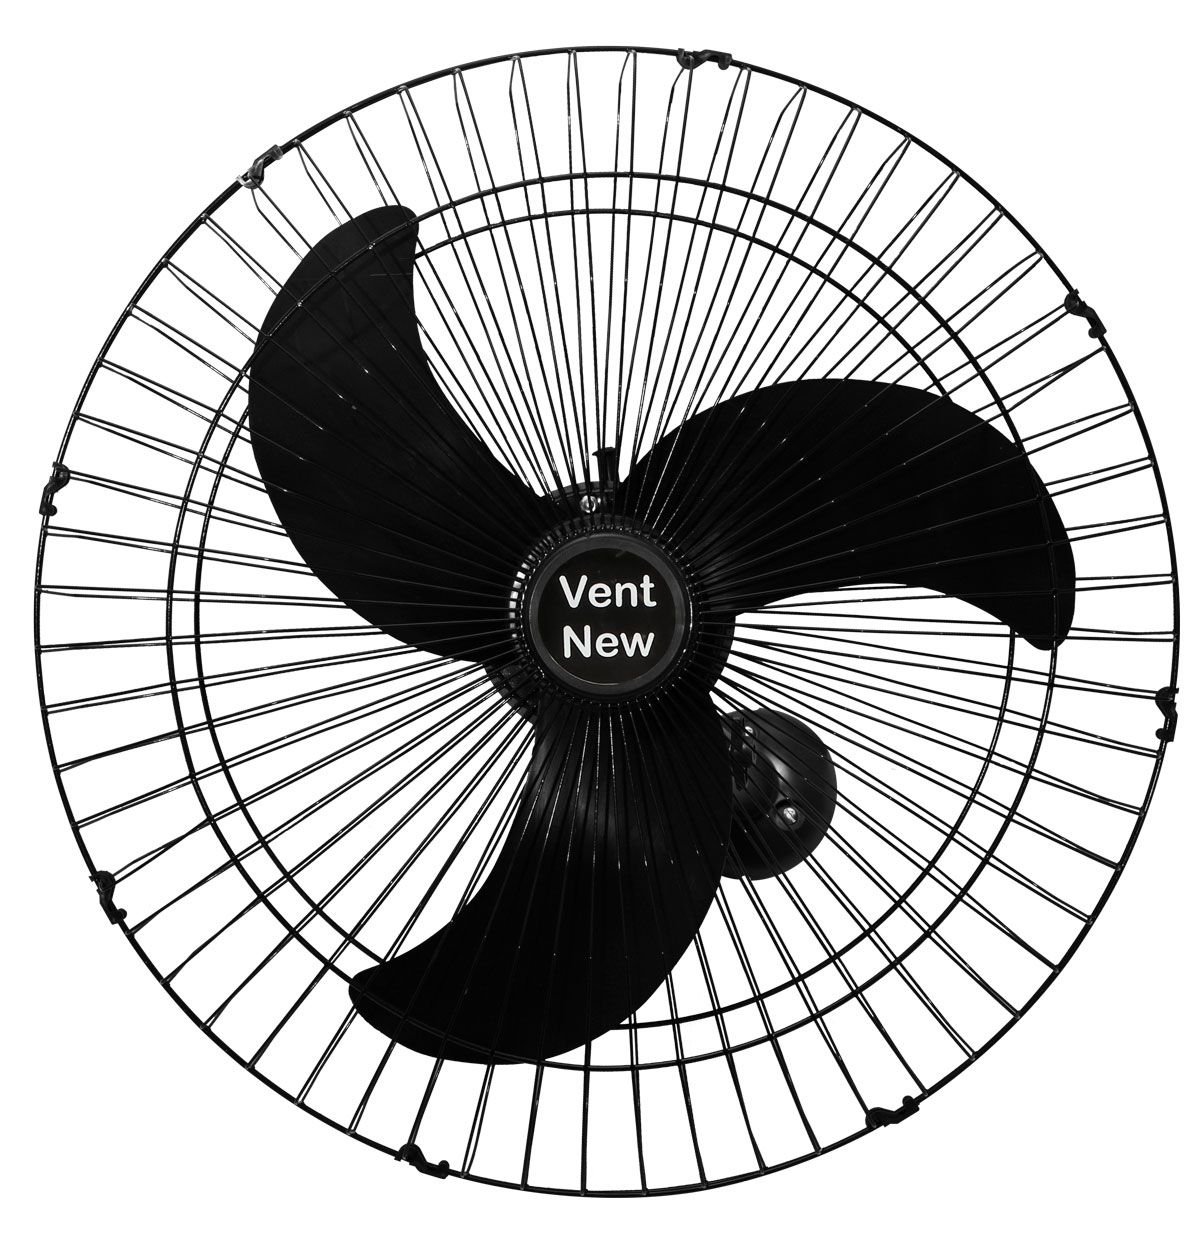 Kit 6 Ventiladores Parede Bivolt Preto Oscilante 60 Cm